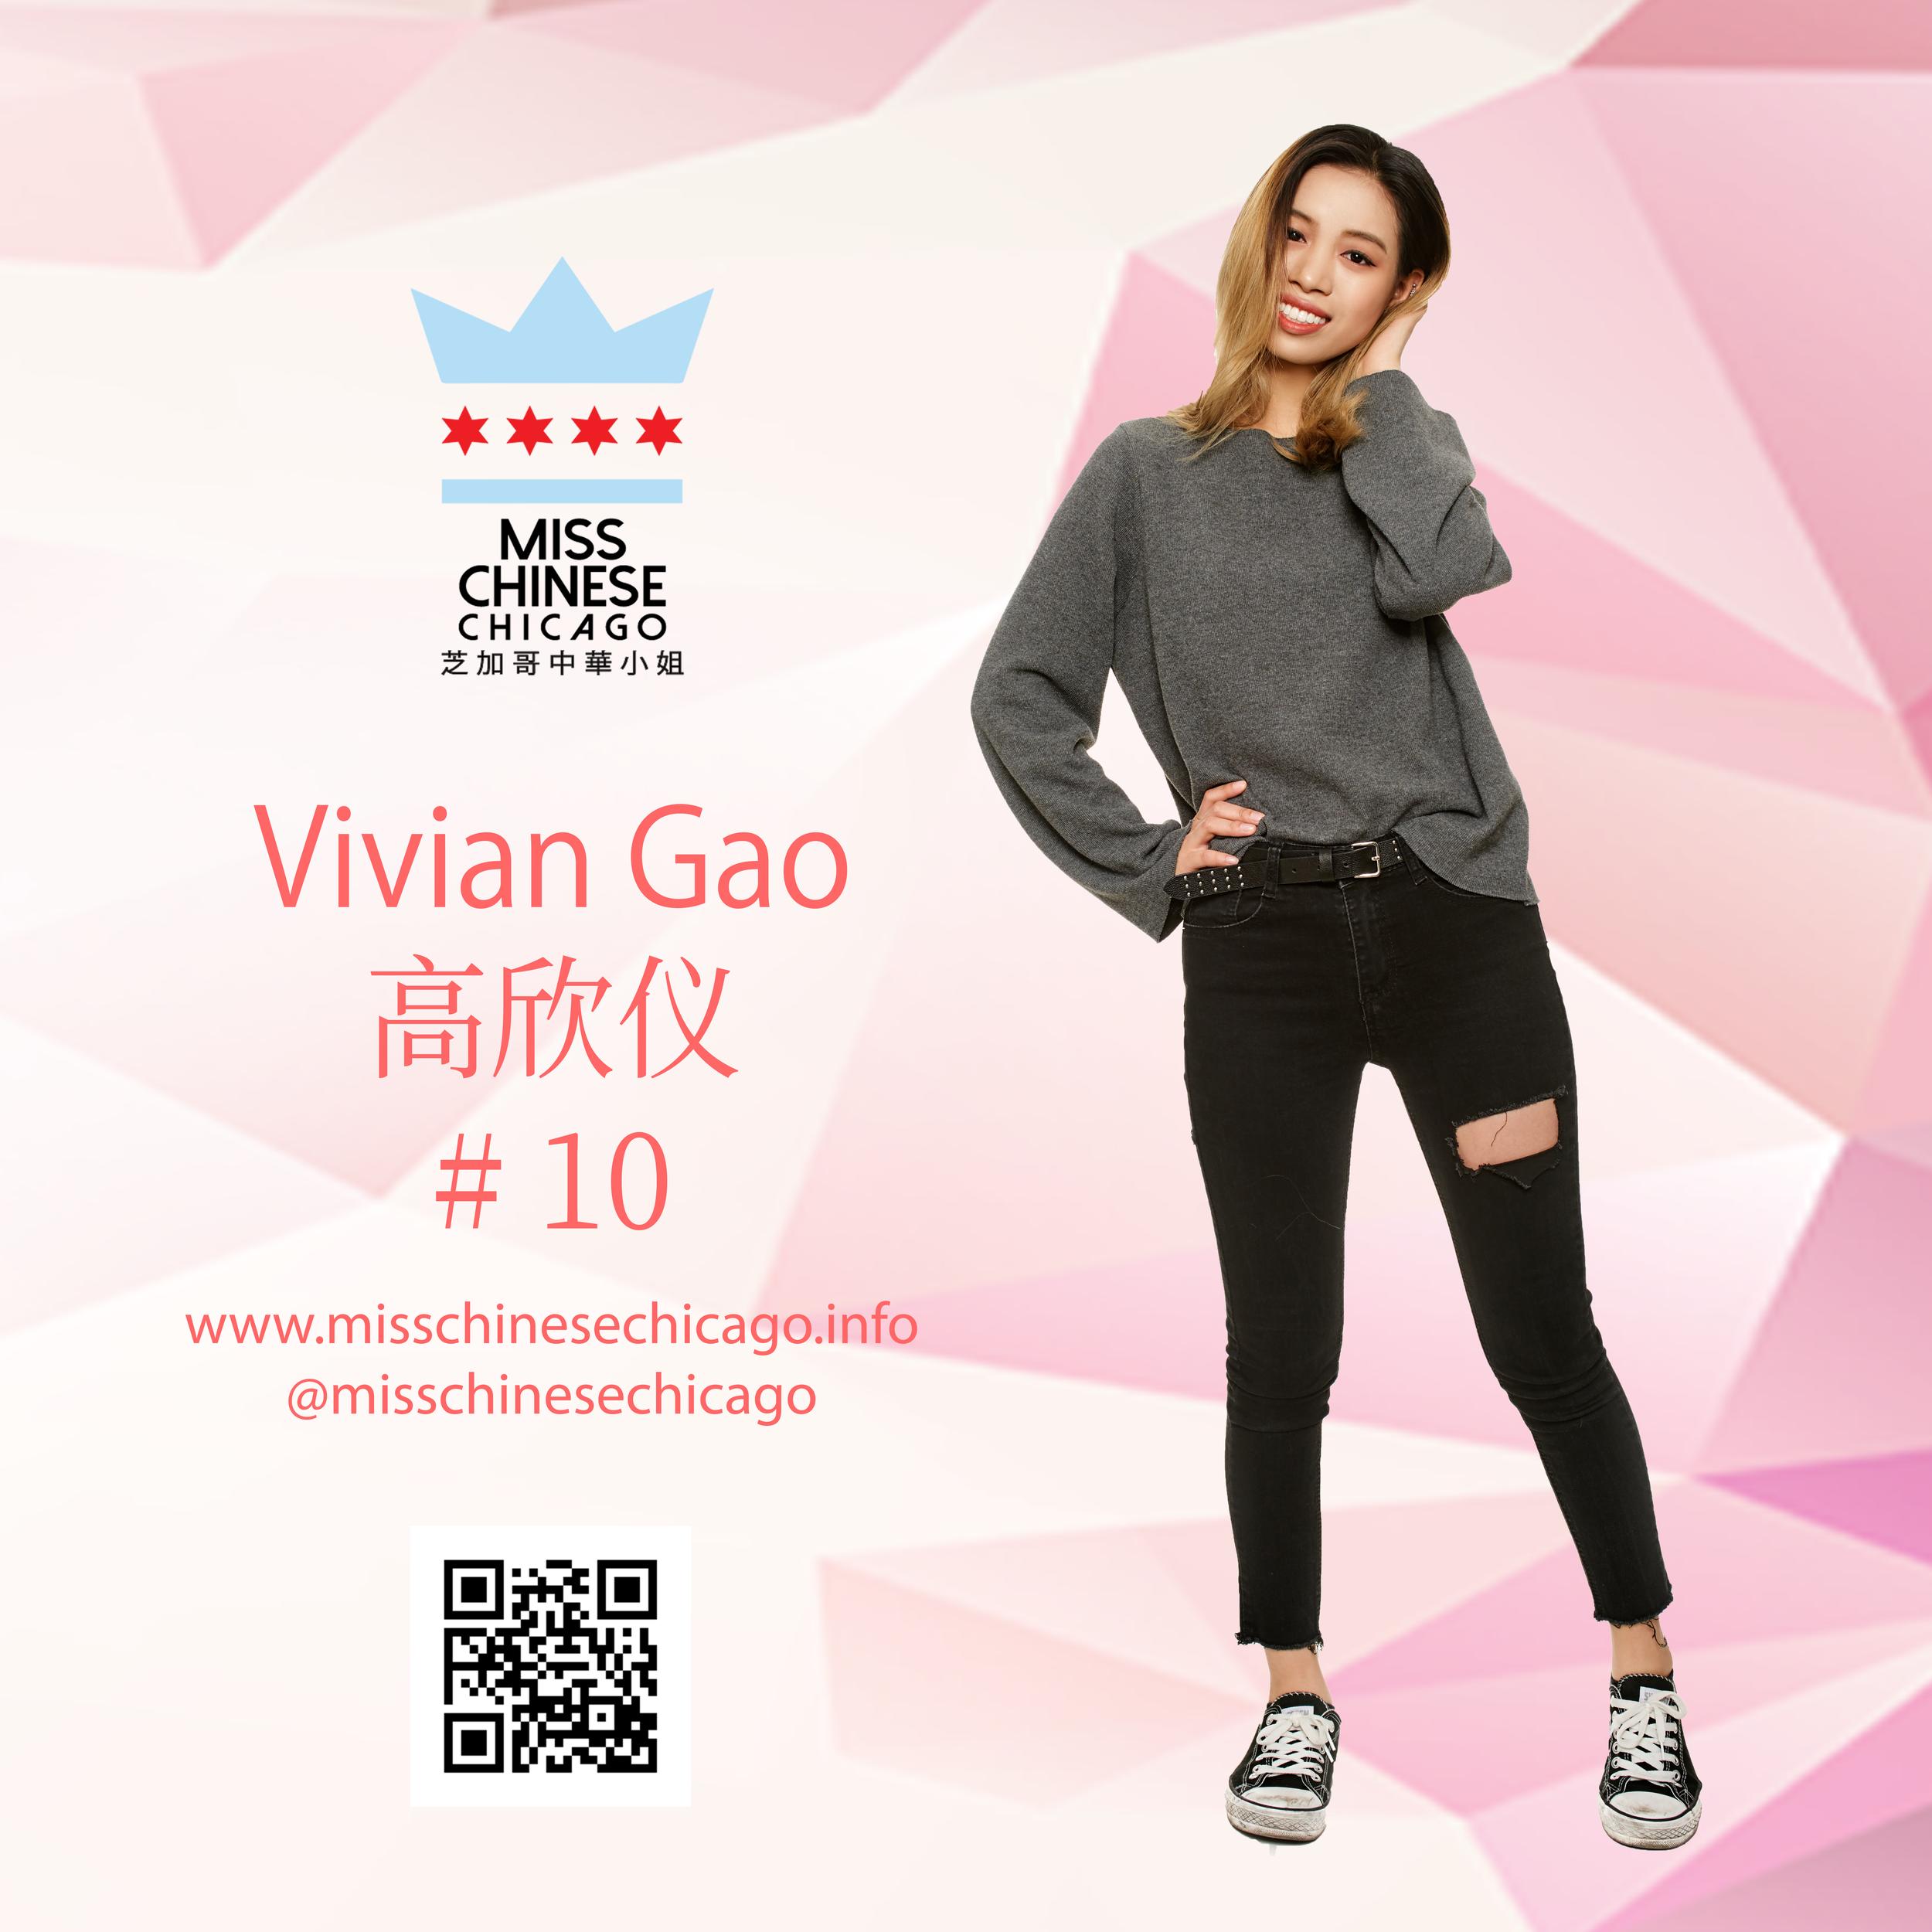 Vivian_Gao_Personality_IG.png